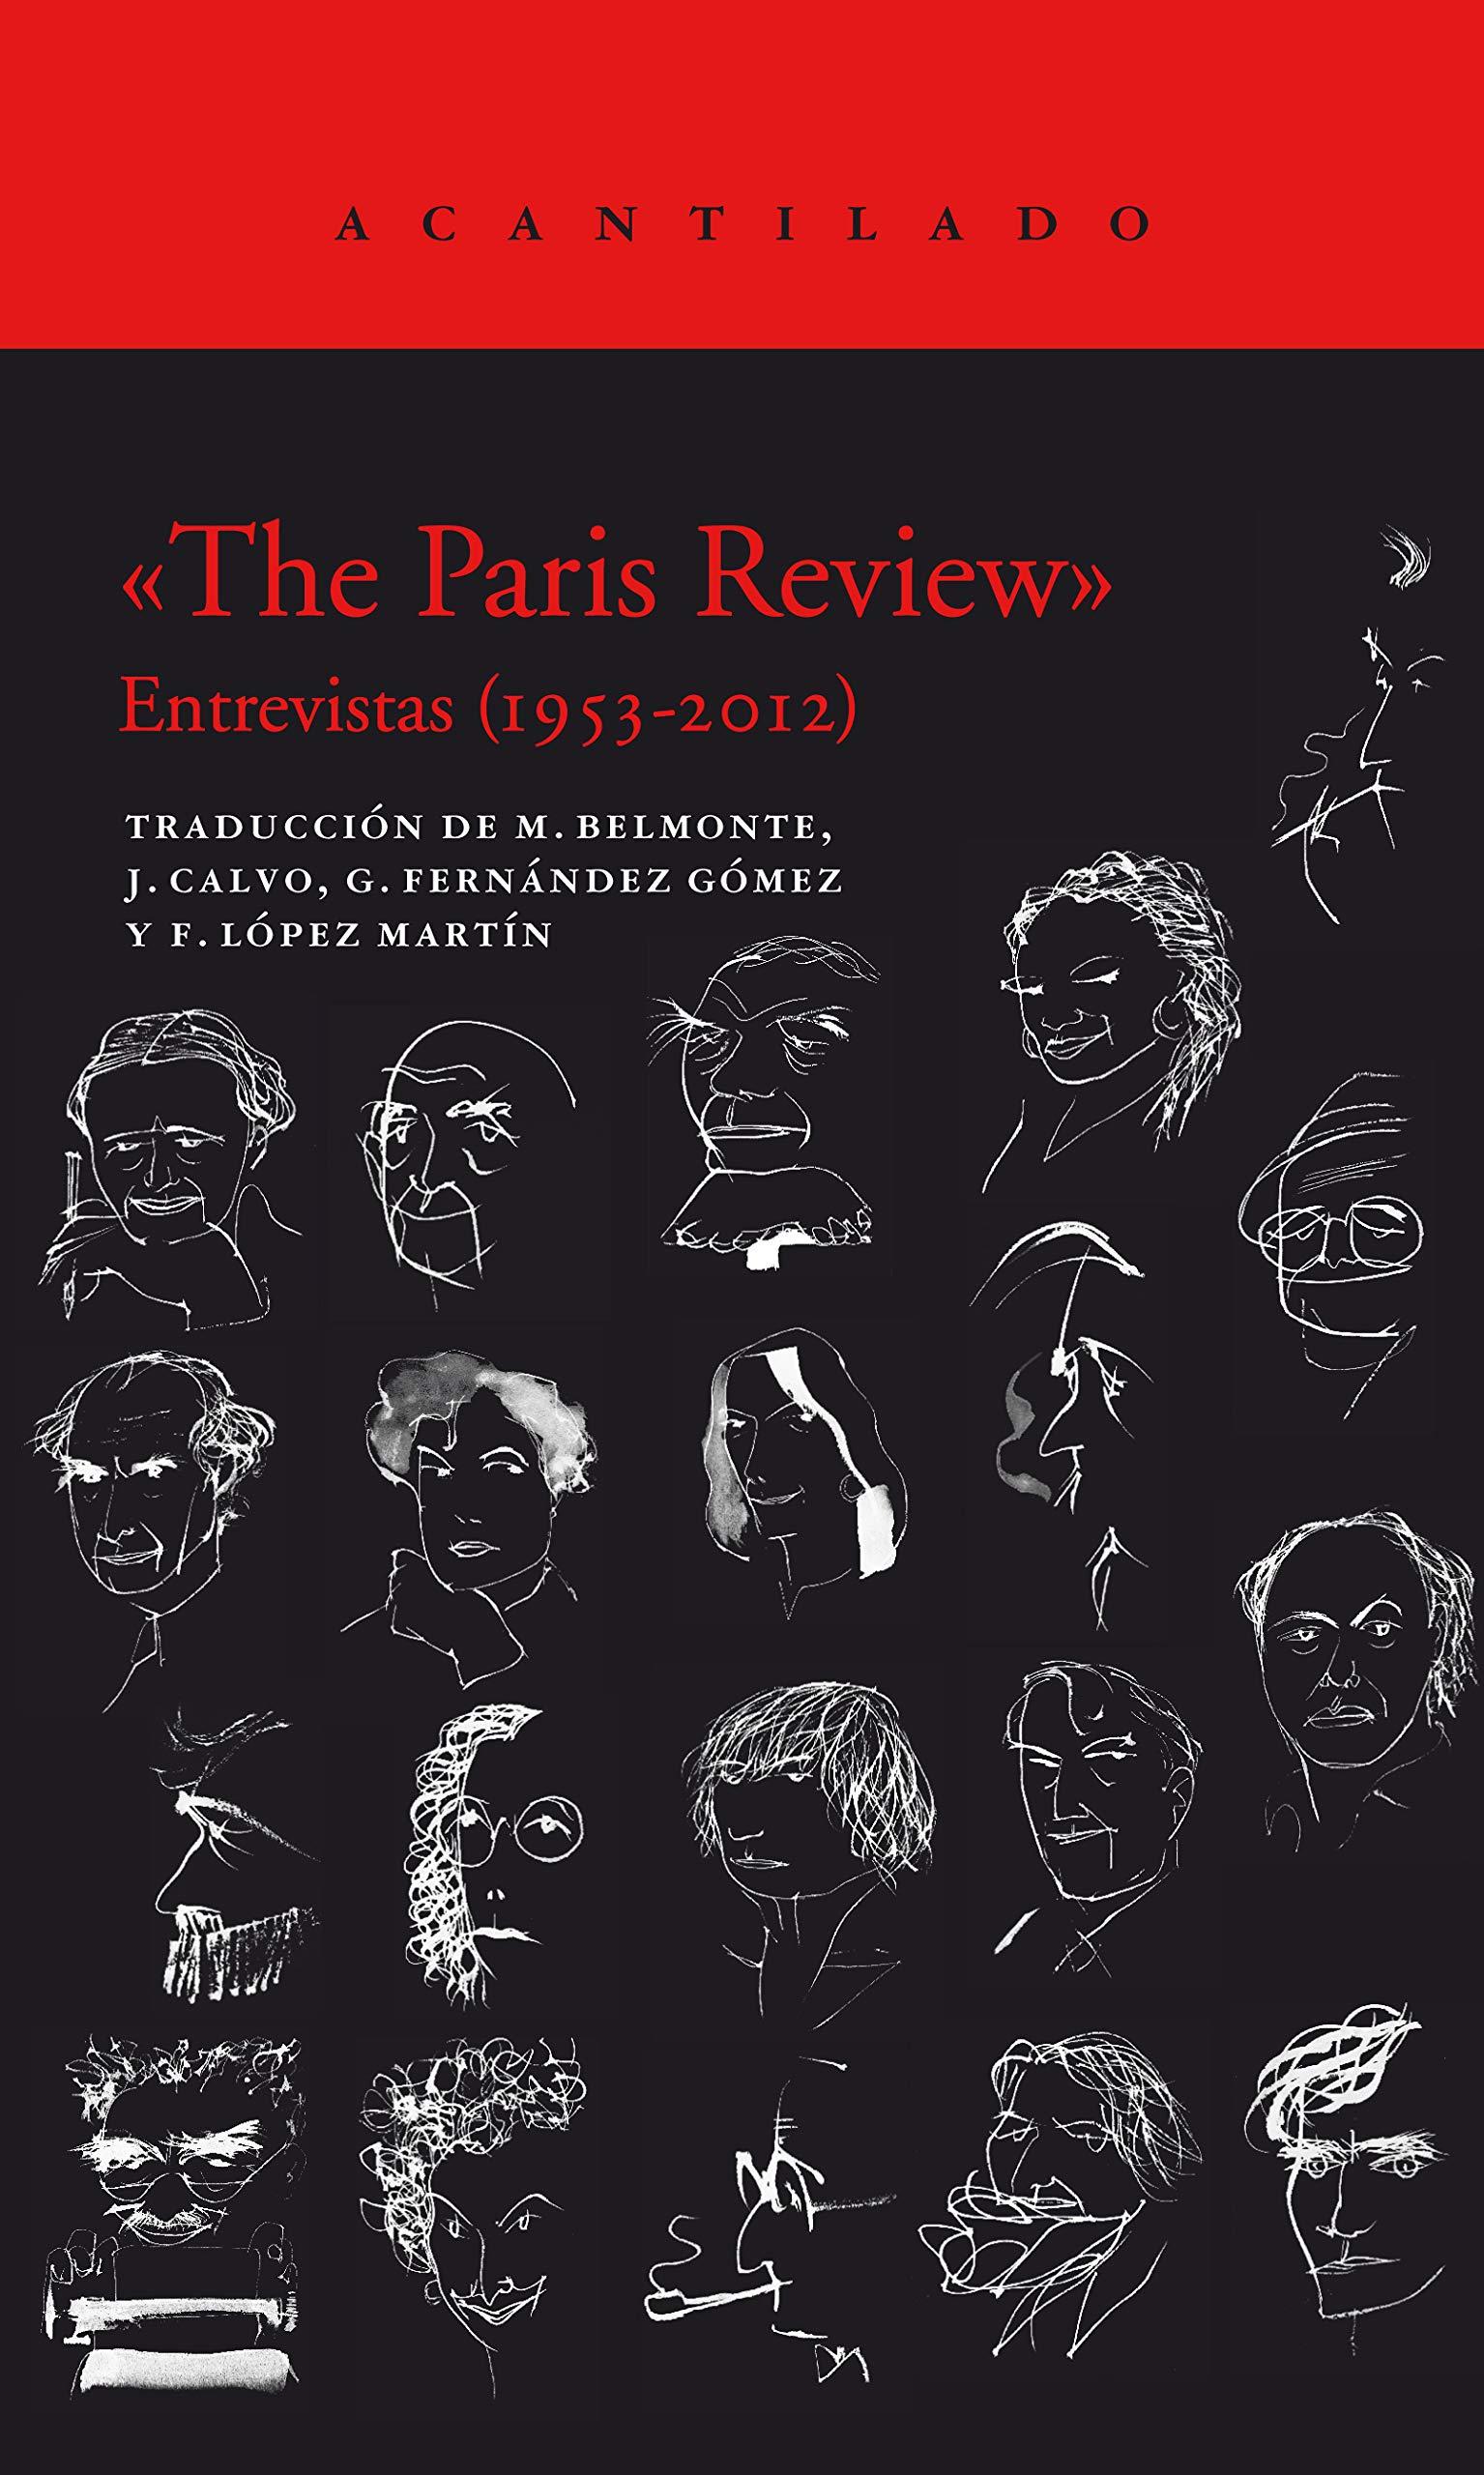 The Paris Review. Entrevistas (1953-2012)